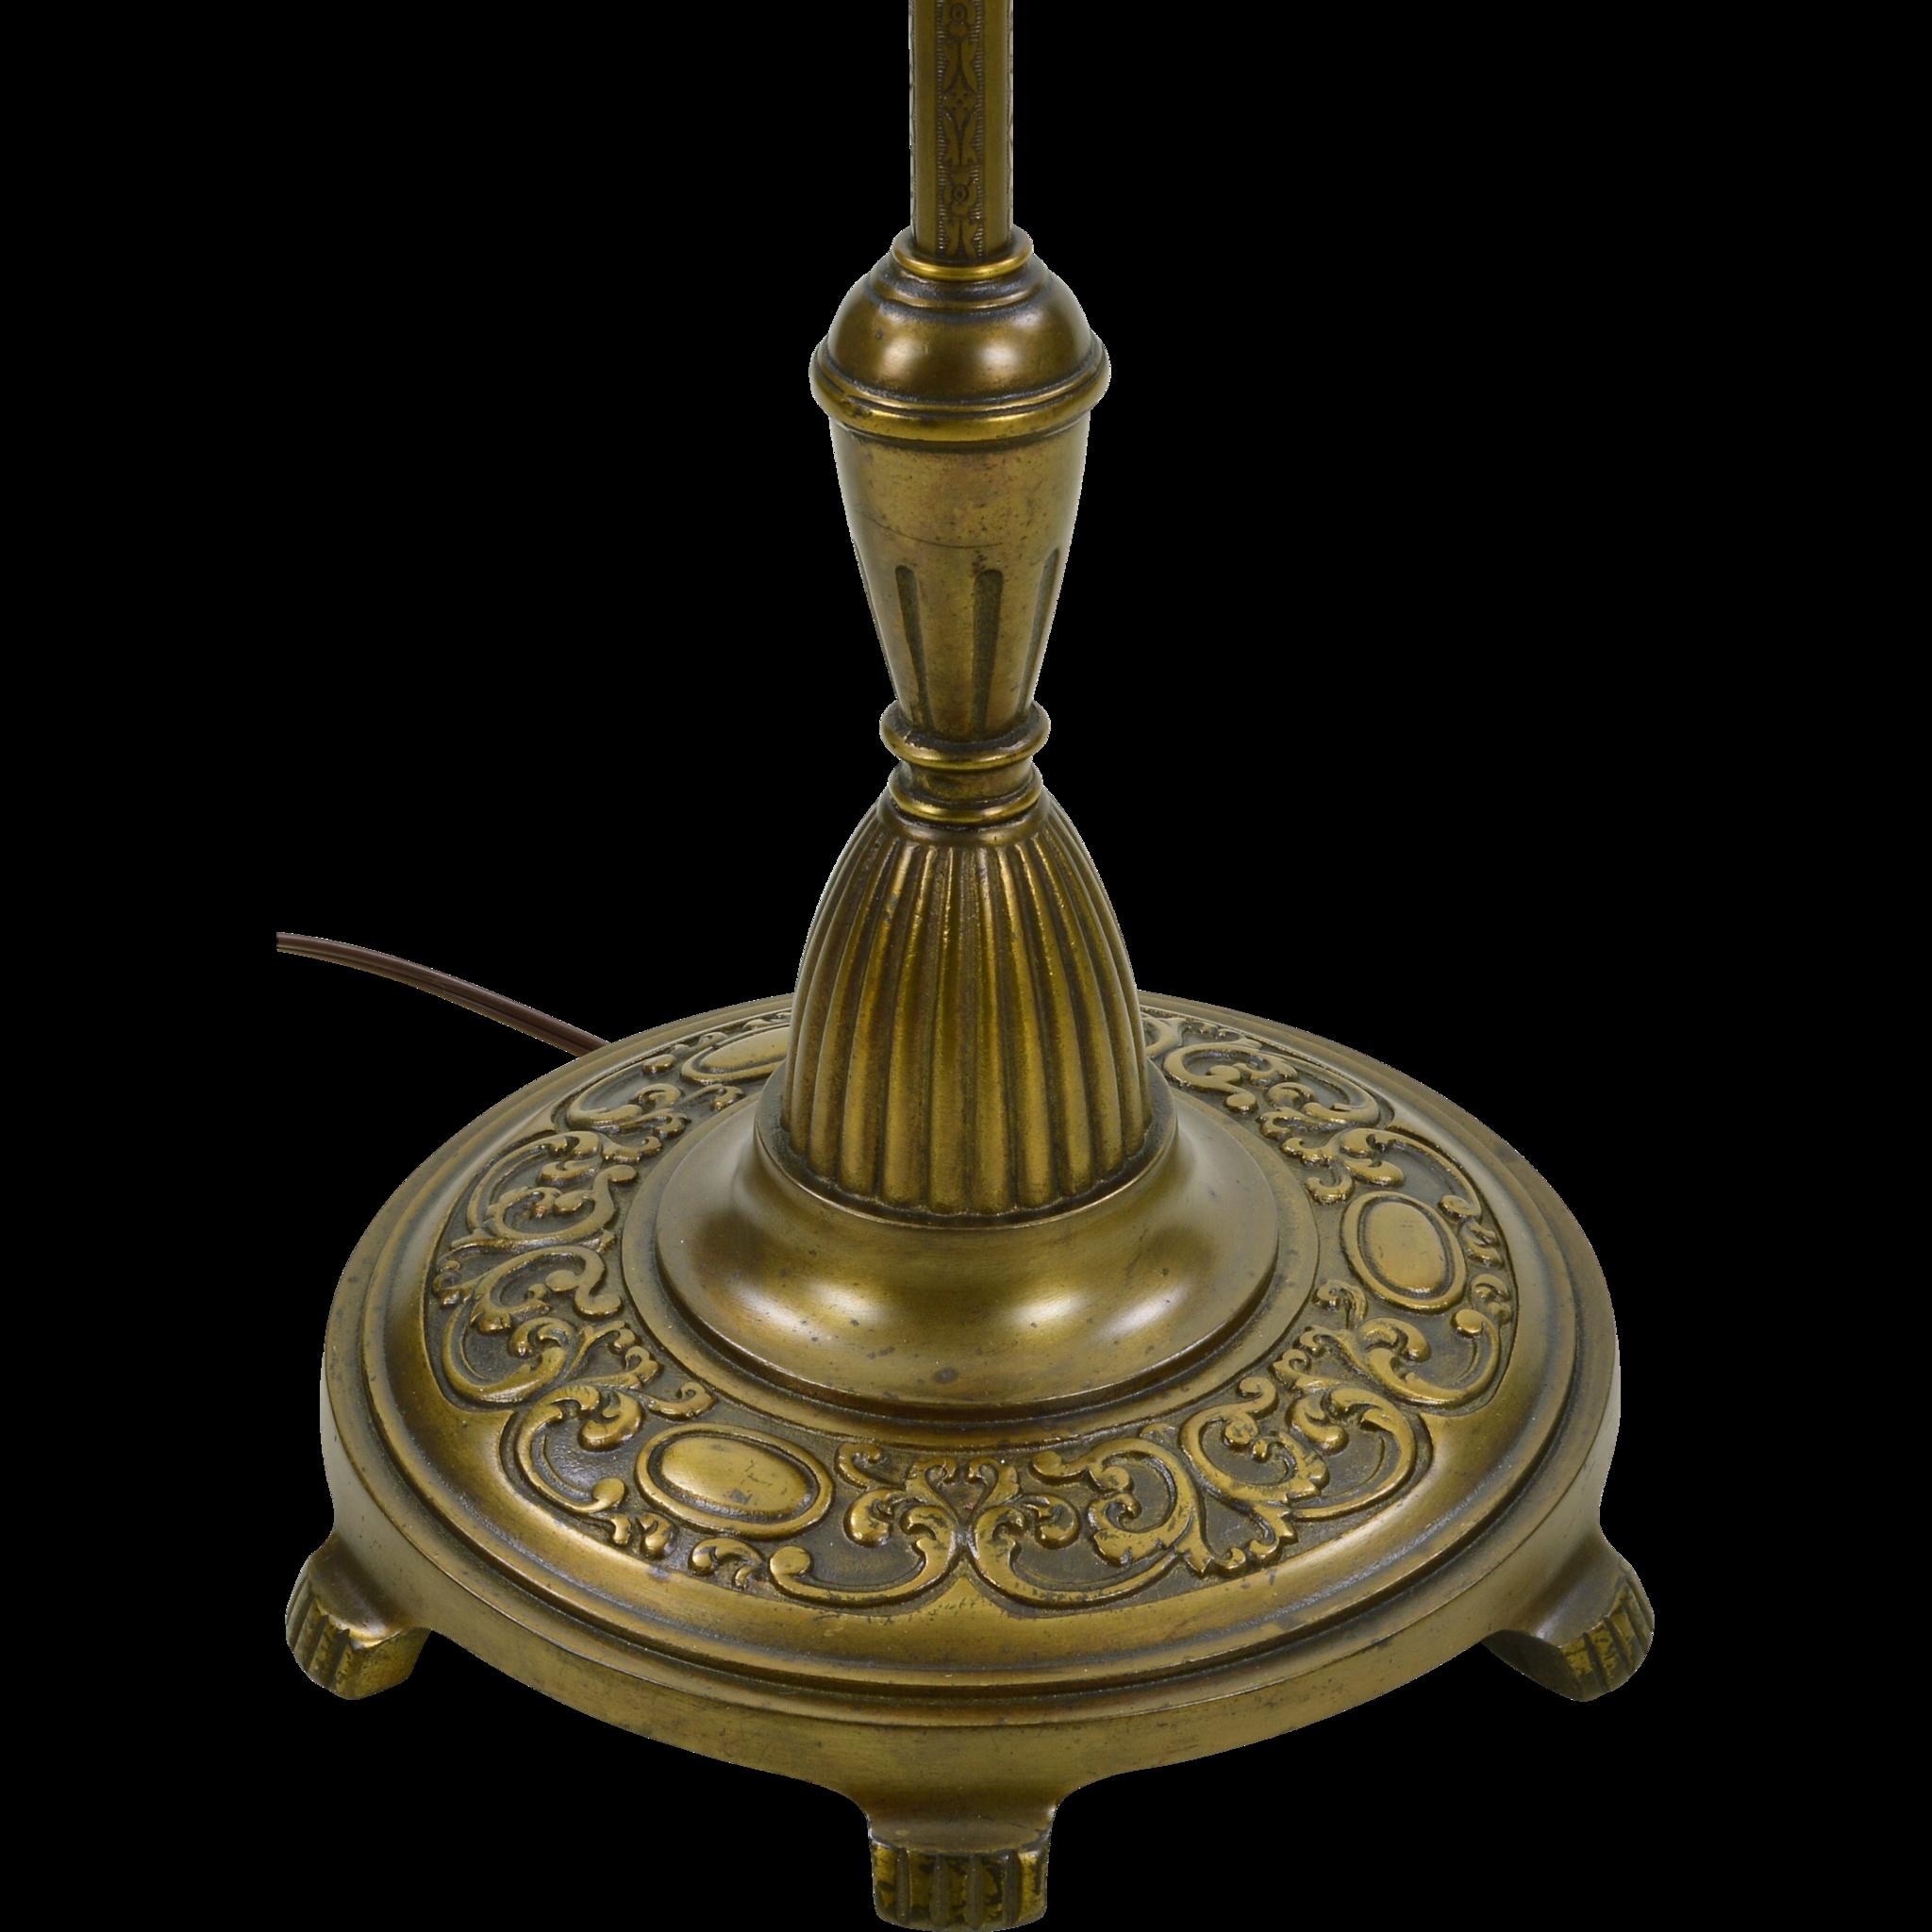 Vintage Rembrandt Floor Lamp Mesh Shade Reserved For D